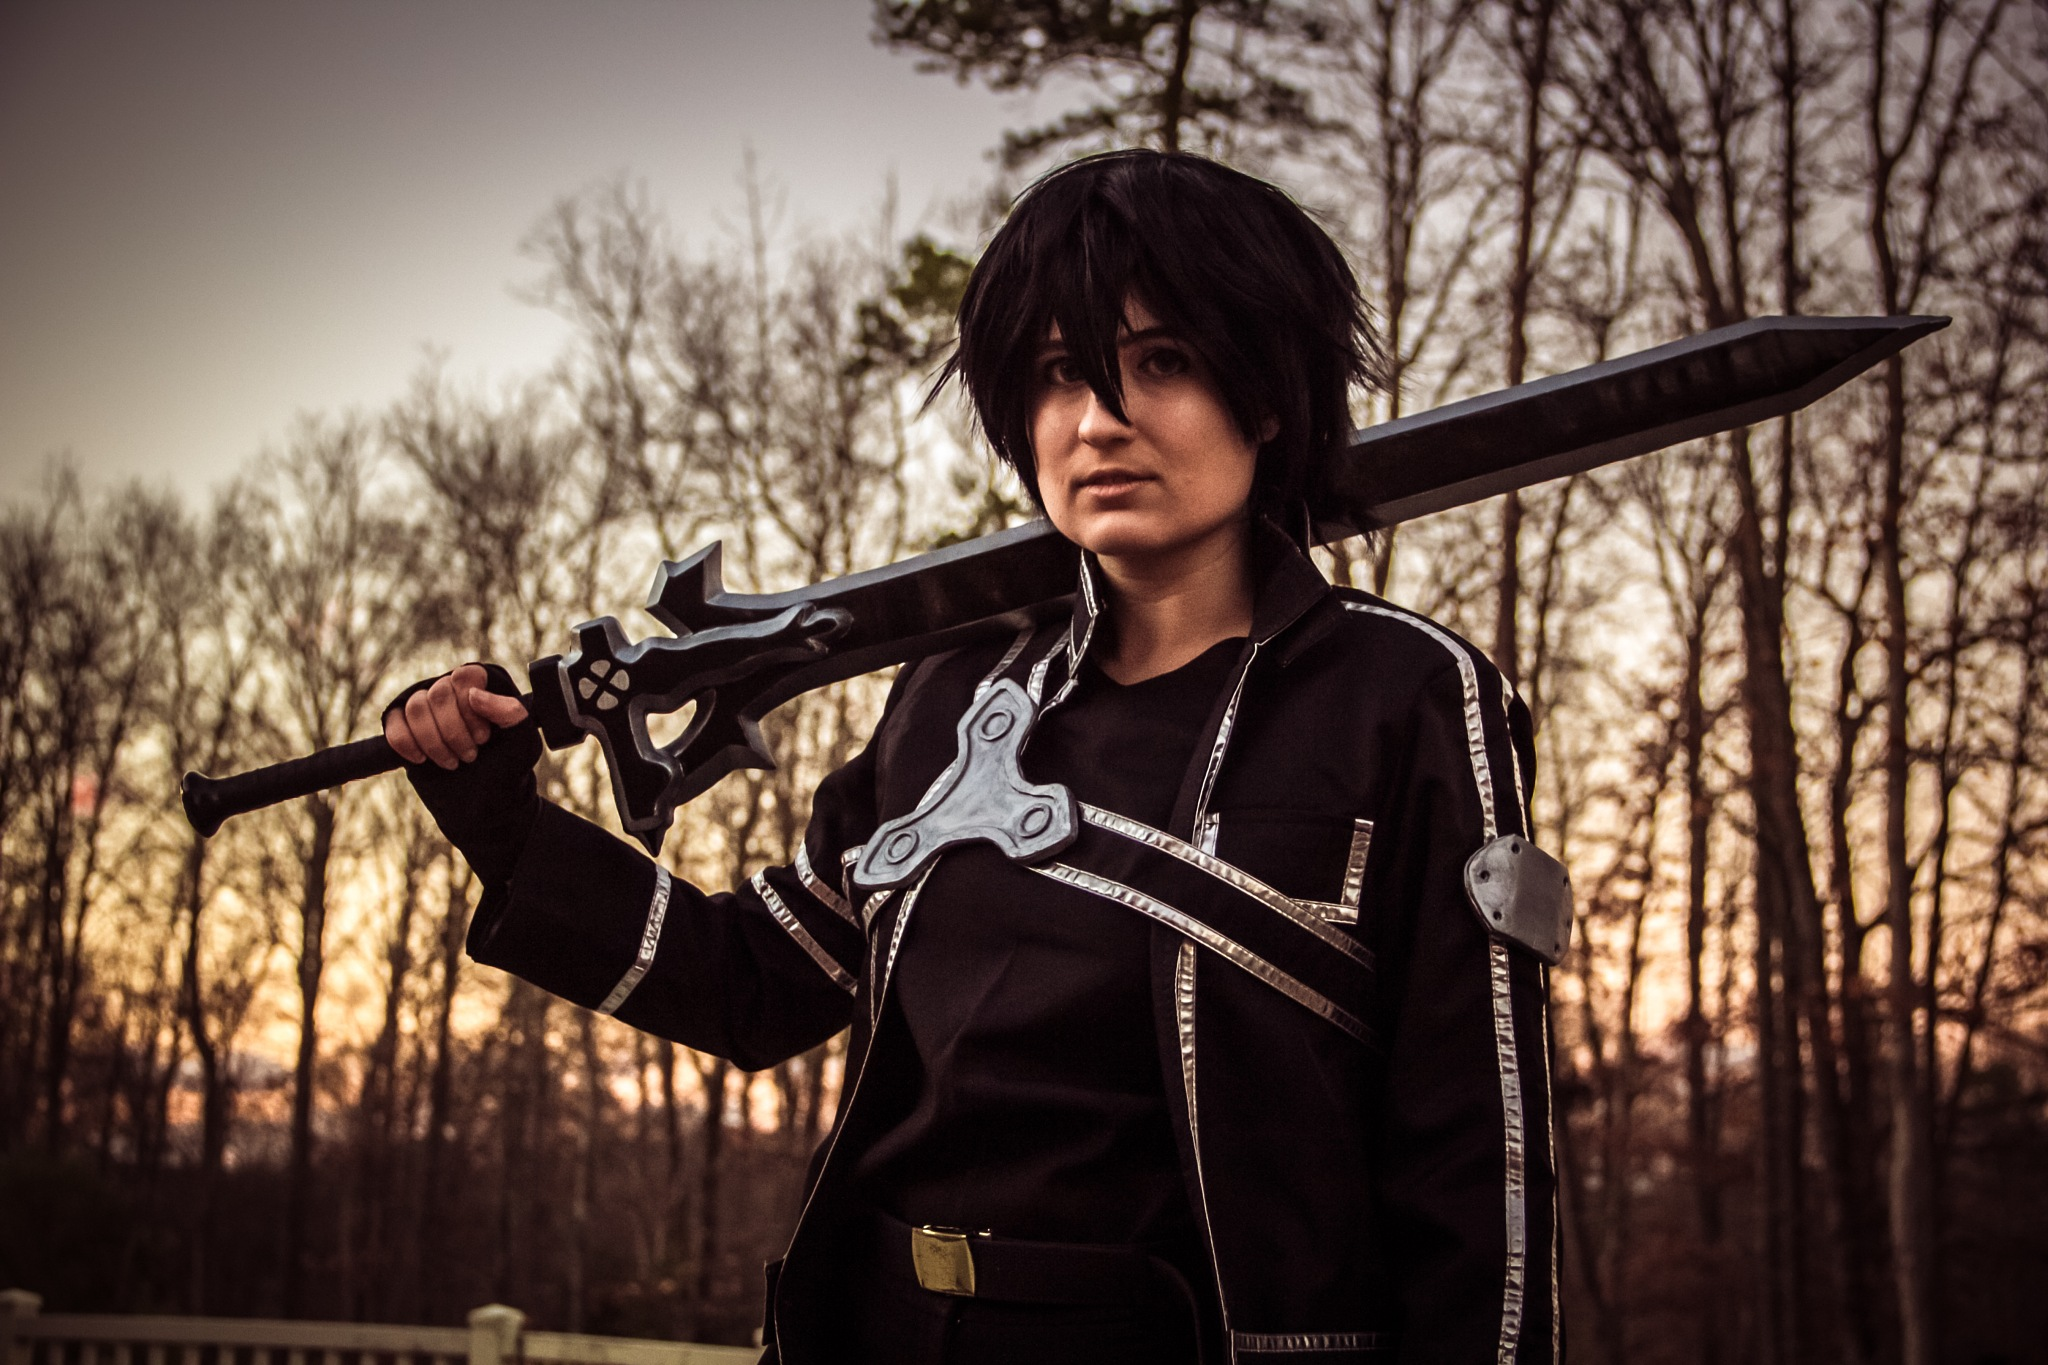 Ichibancon 2017 - IIloria Cosplay - Session #1 Sword Art Online by Gina Adkins